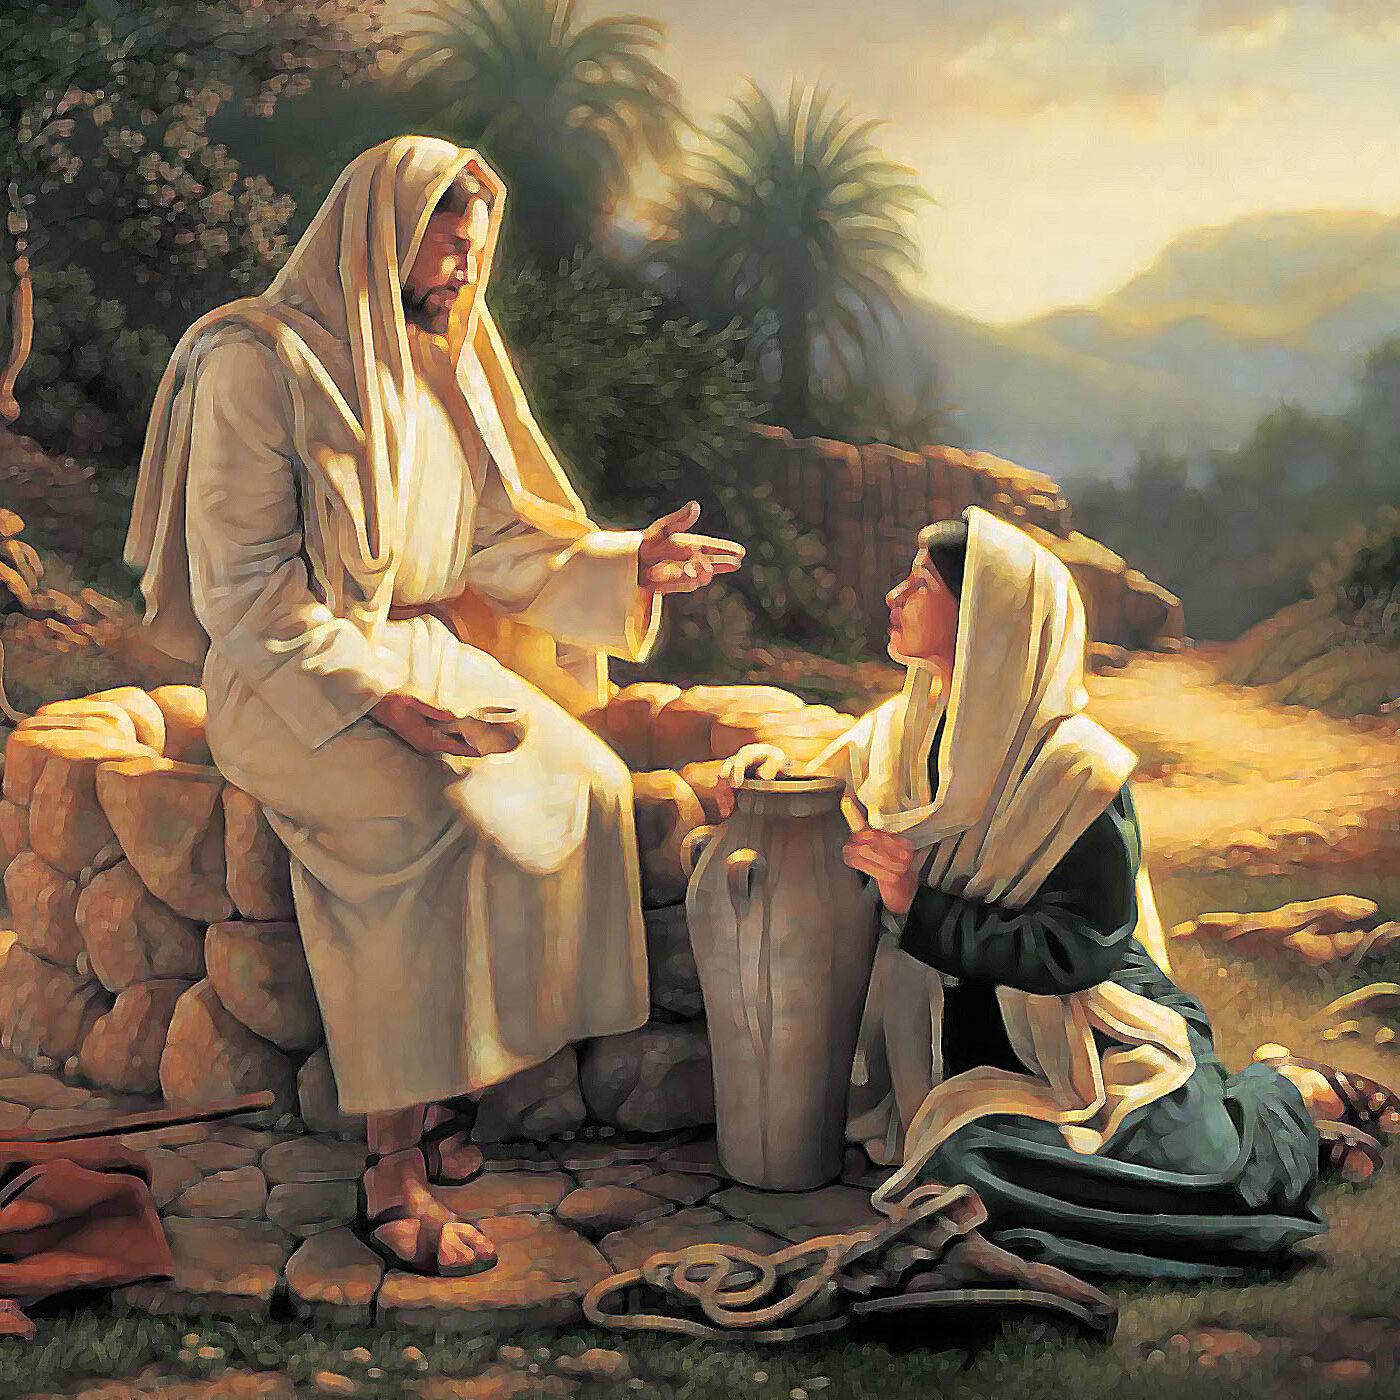 riflessioni sul Vangelo di Mercoledì 24 Febbraio 2021 (Lc 11, 29-32)